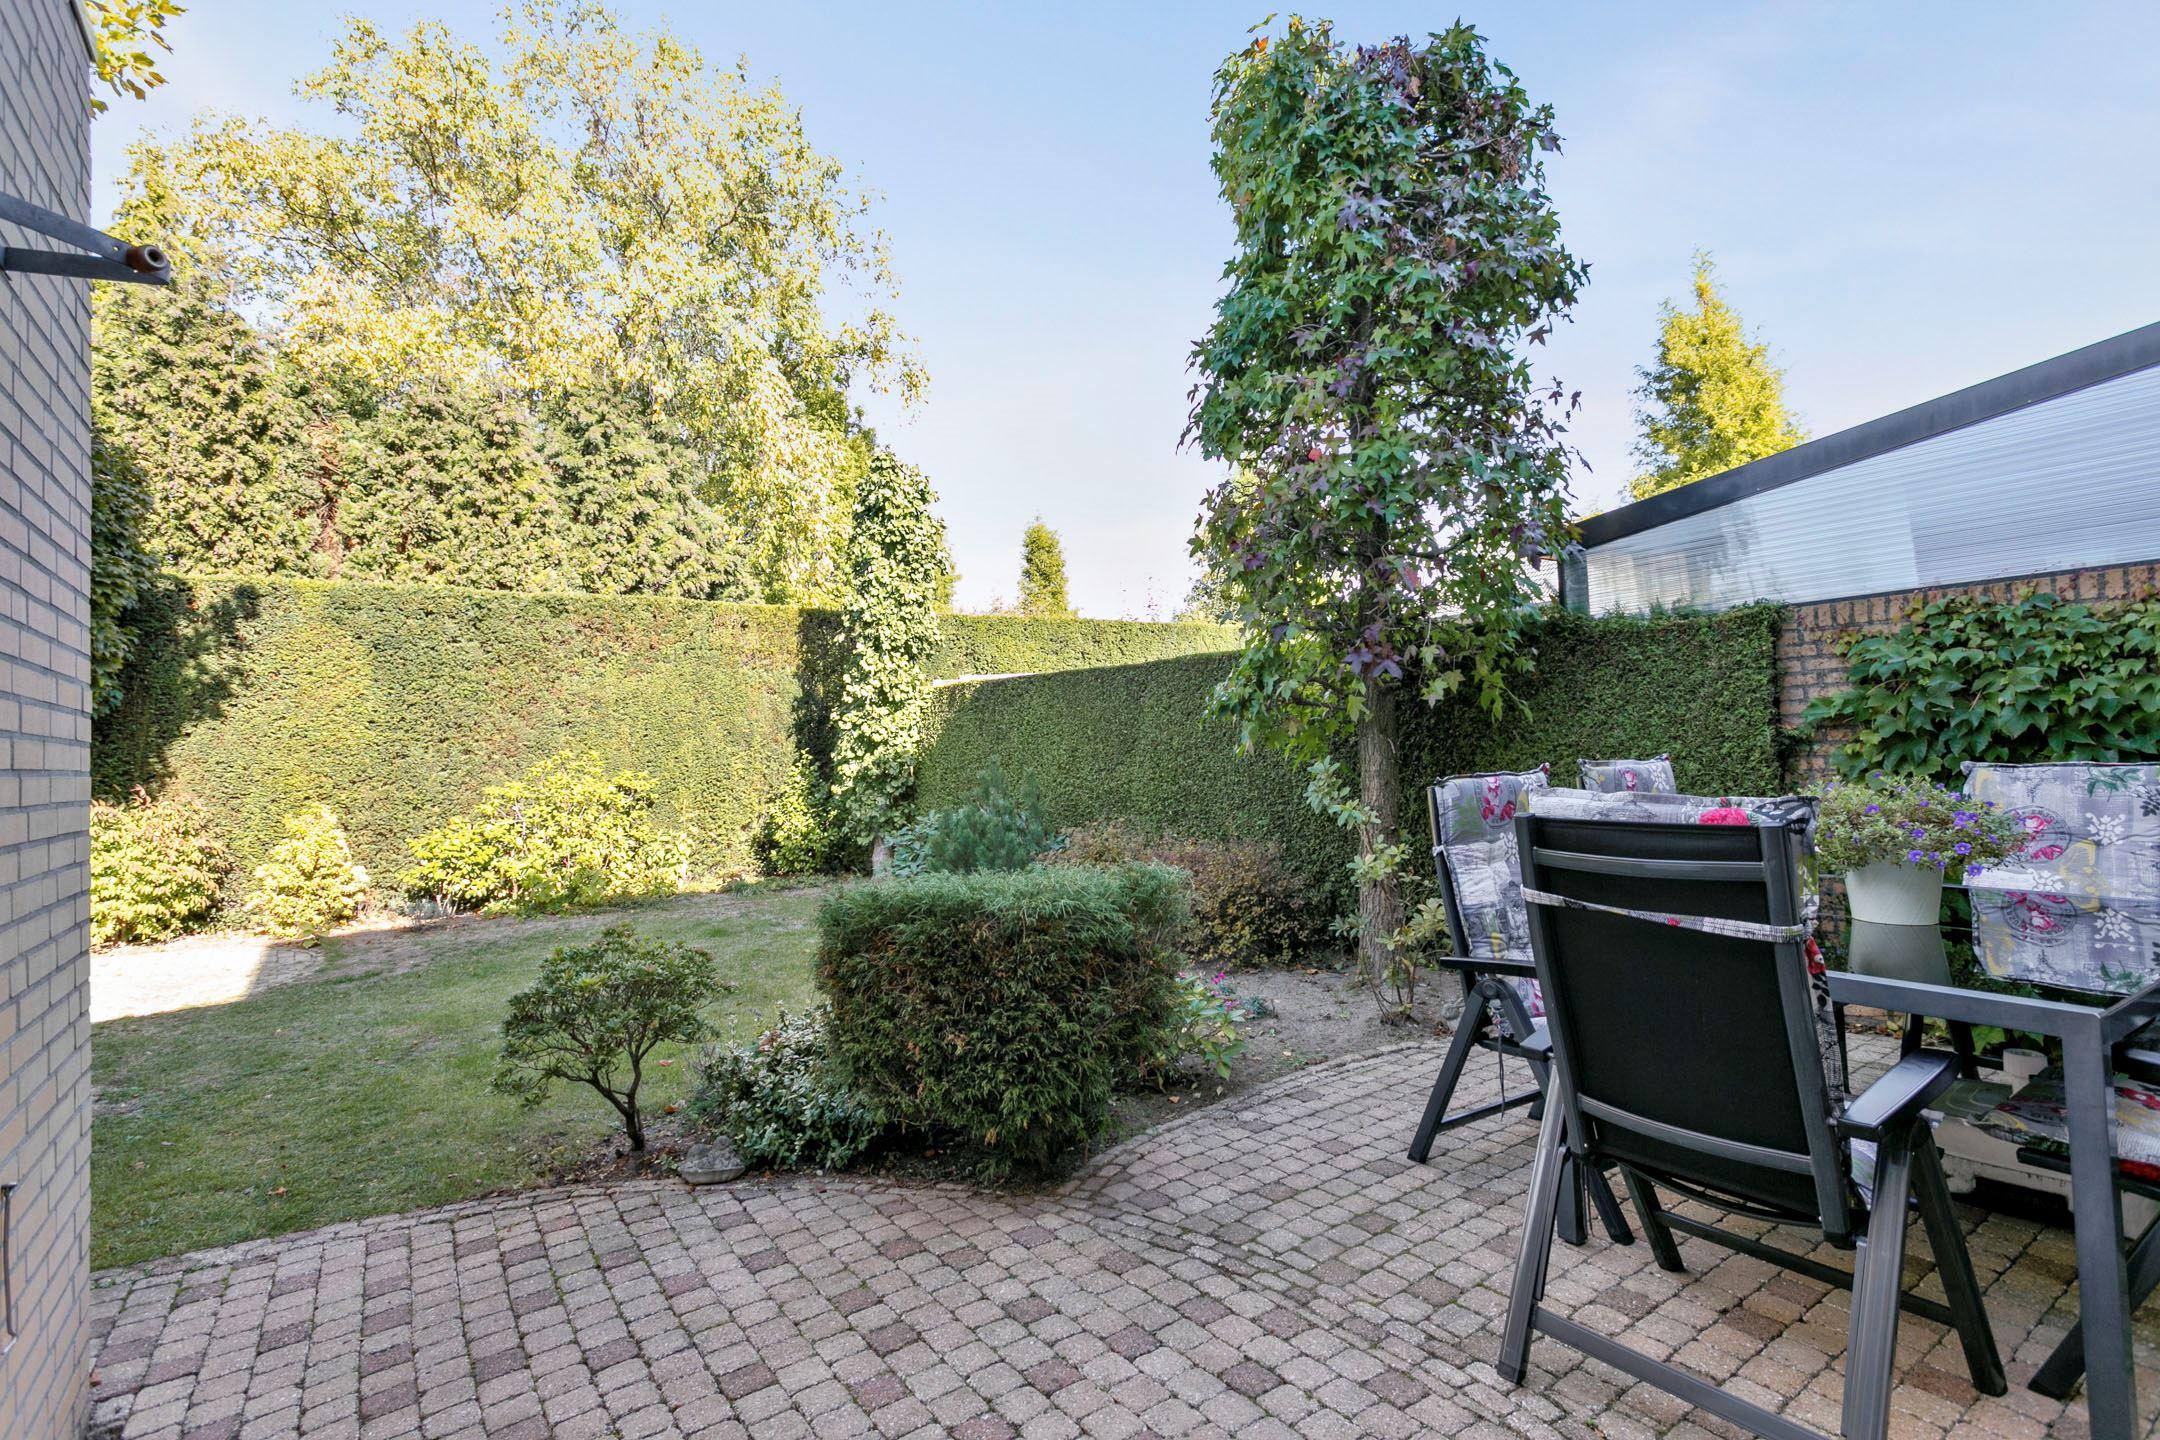 Huis te koop de beekse tuin 93 5673 nk nuenen funda for Huis en tuin nuenen